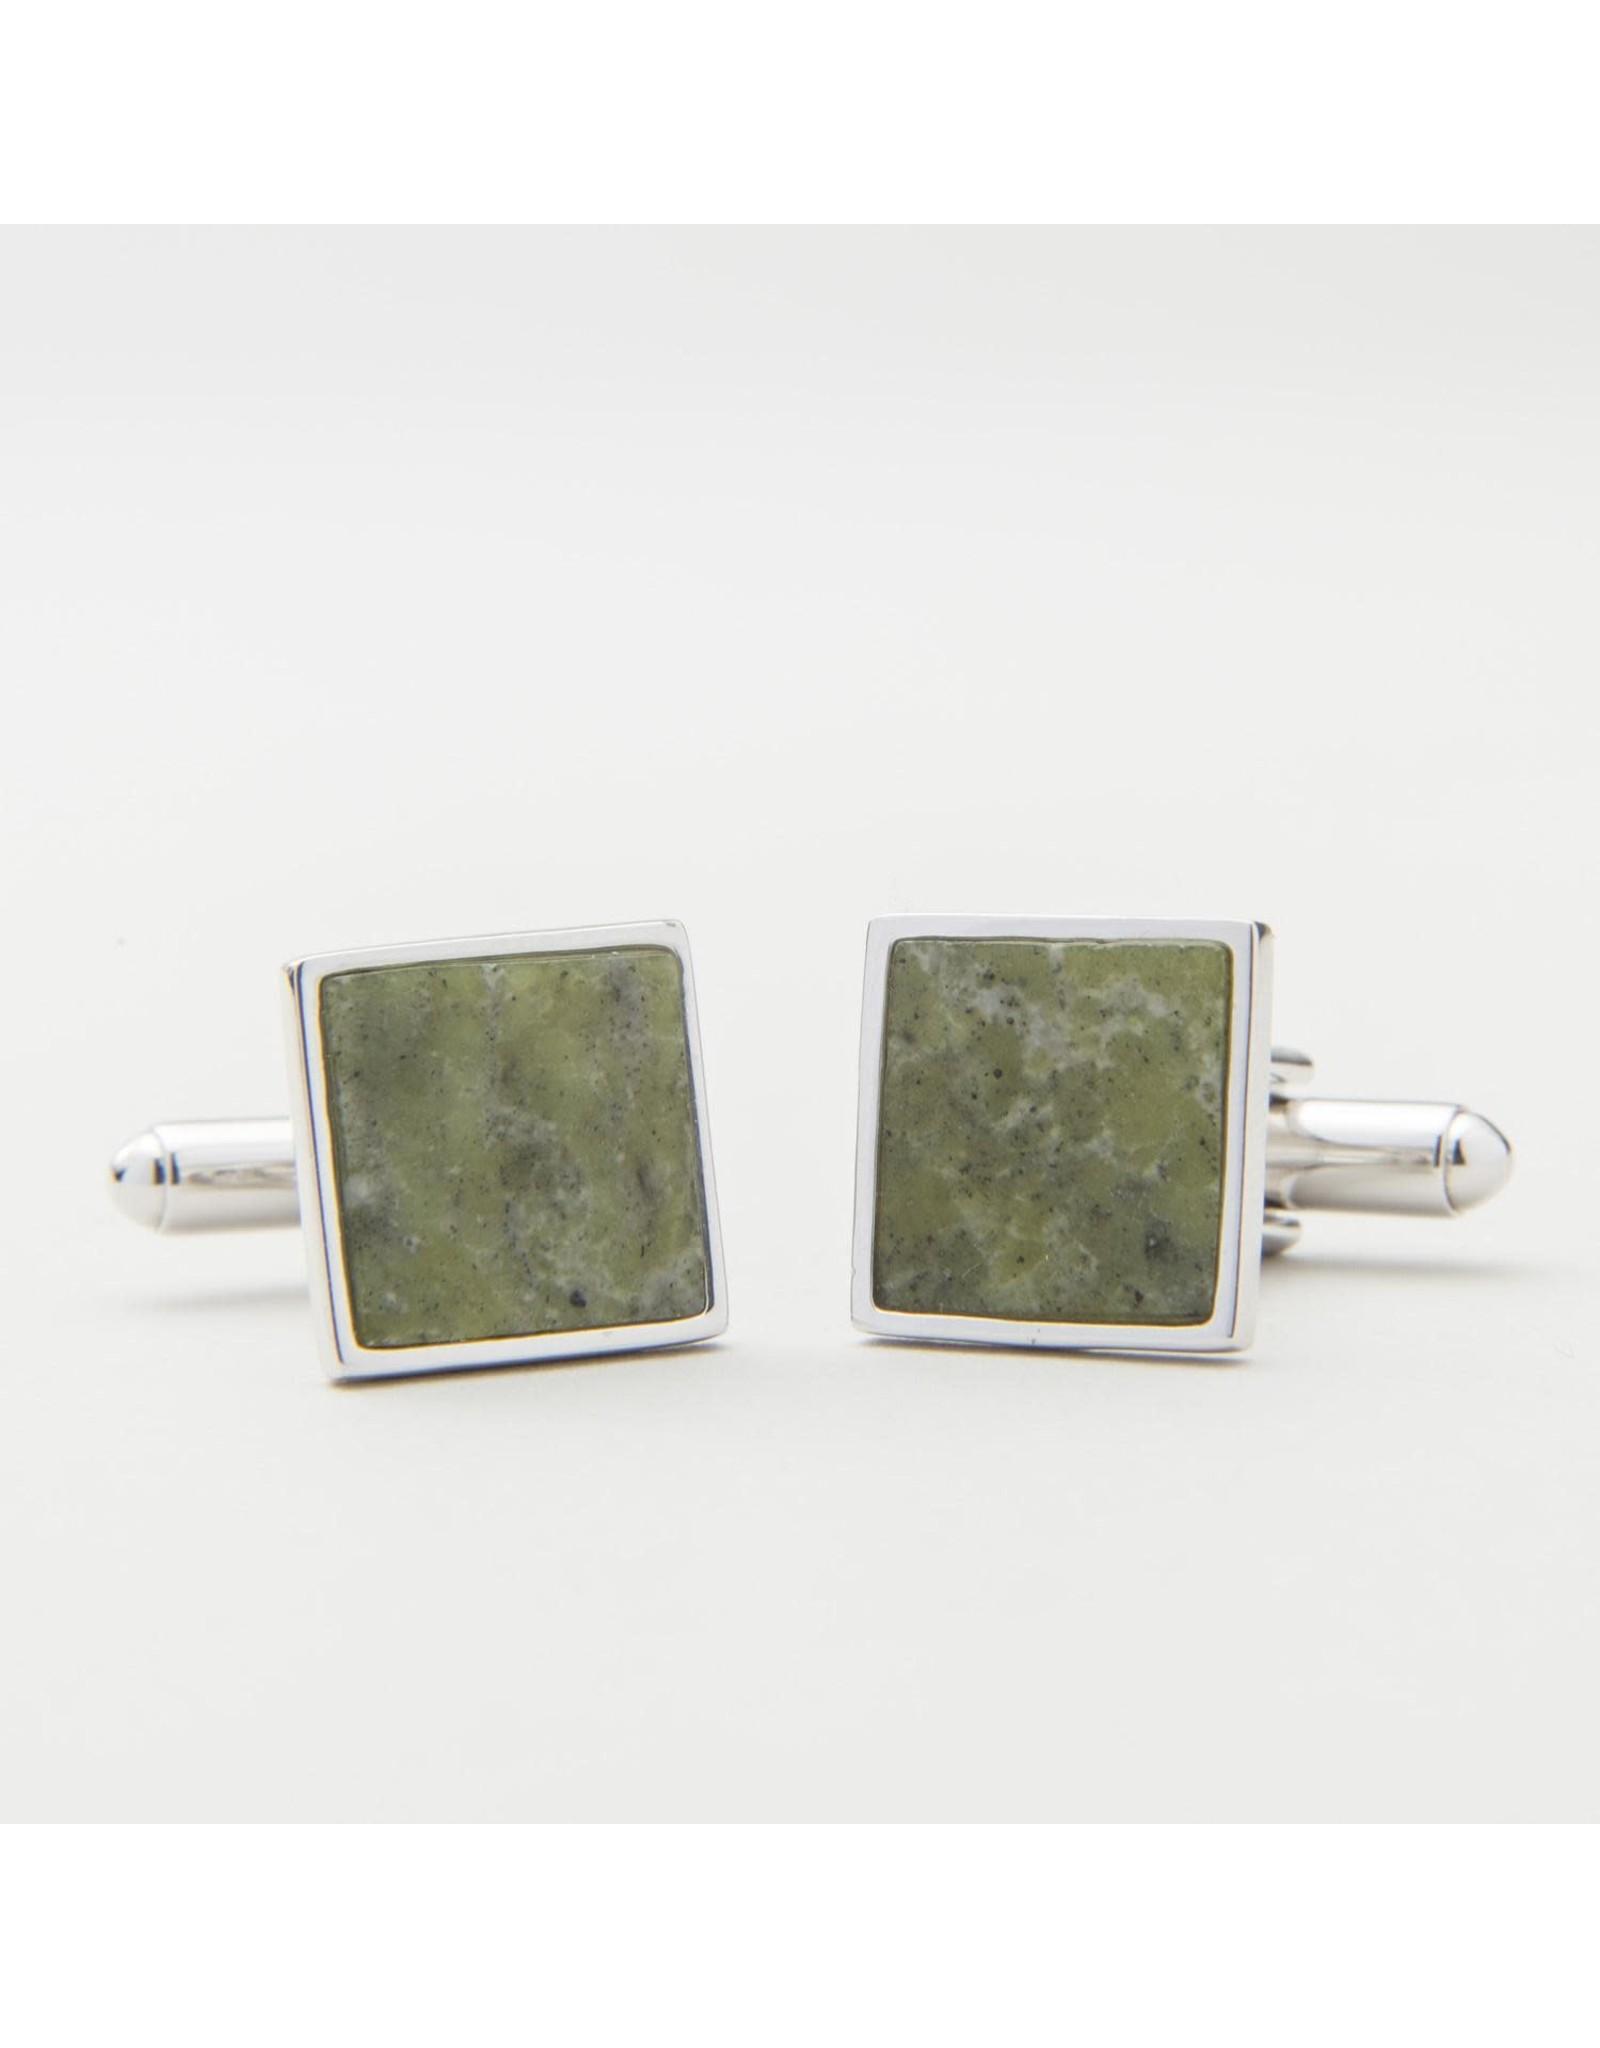 JC Walsh Connemara Marble Cufflinks:  Square